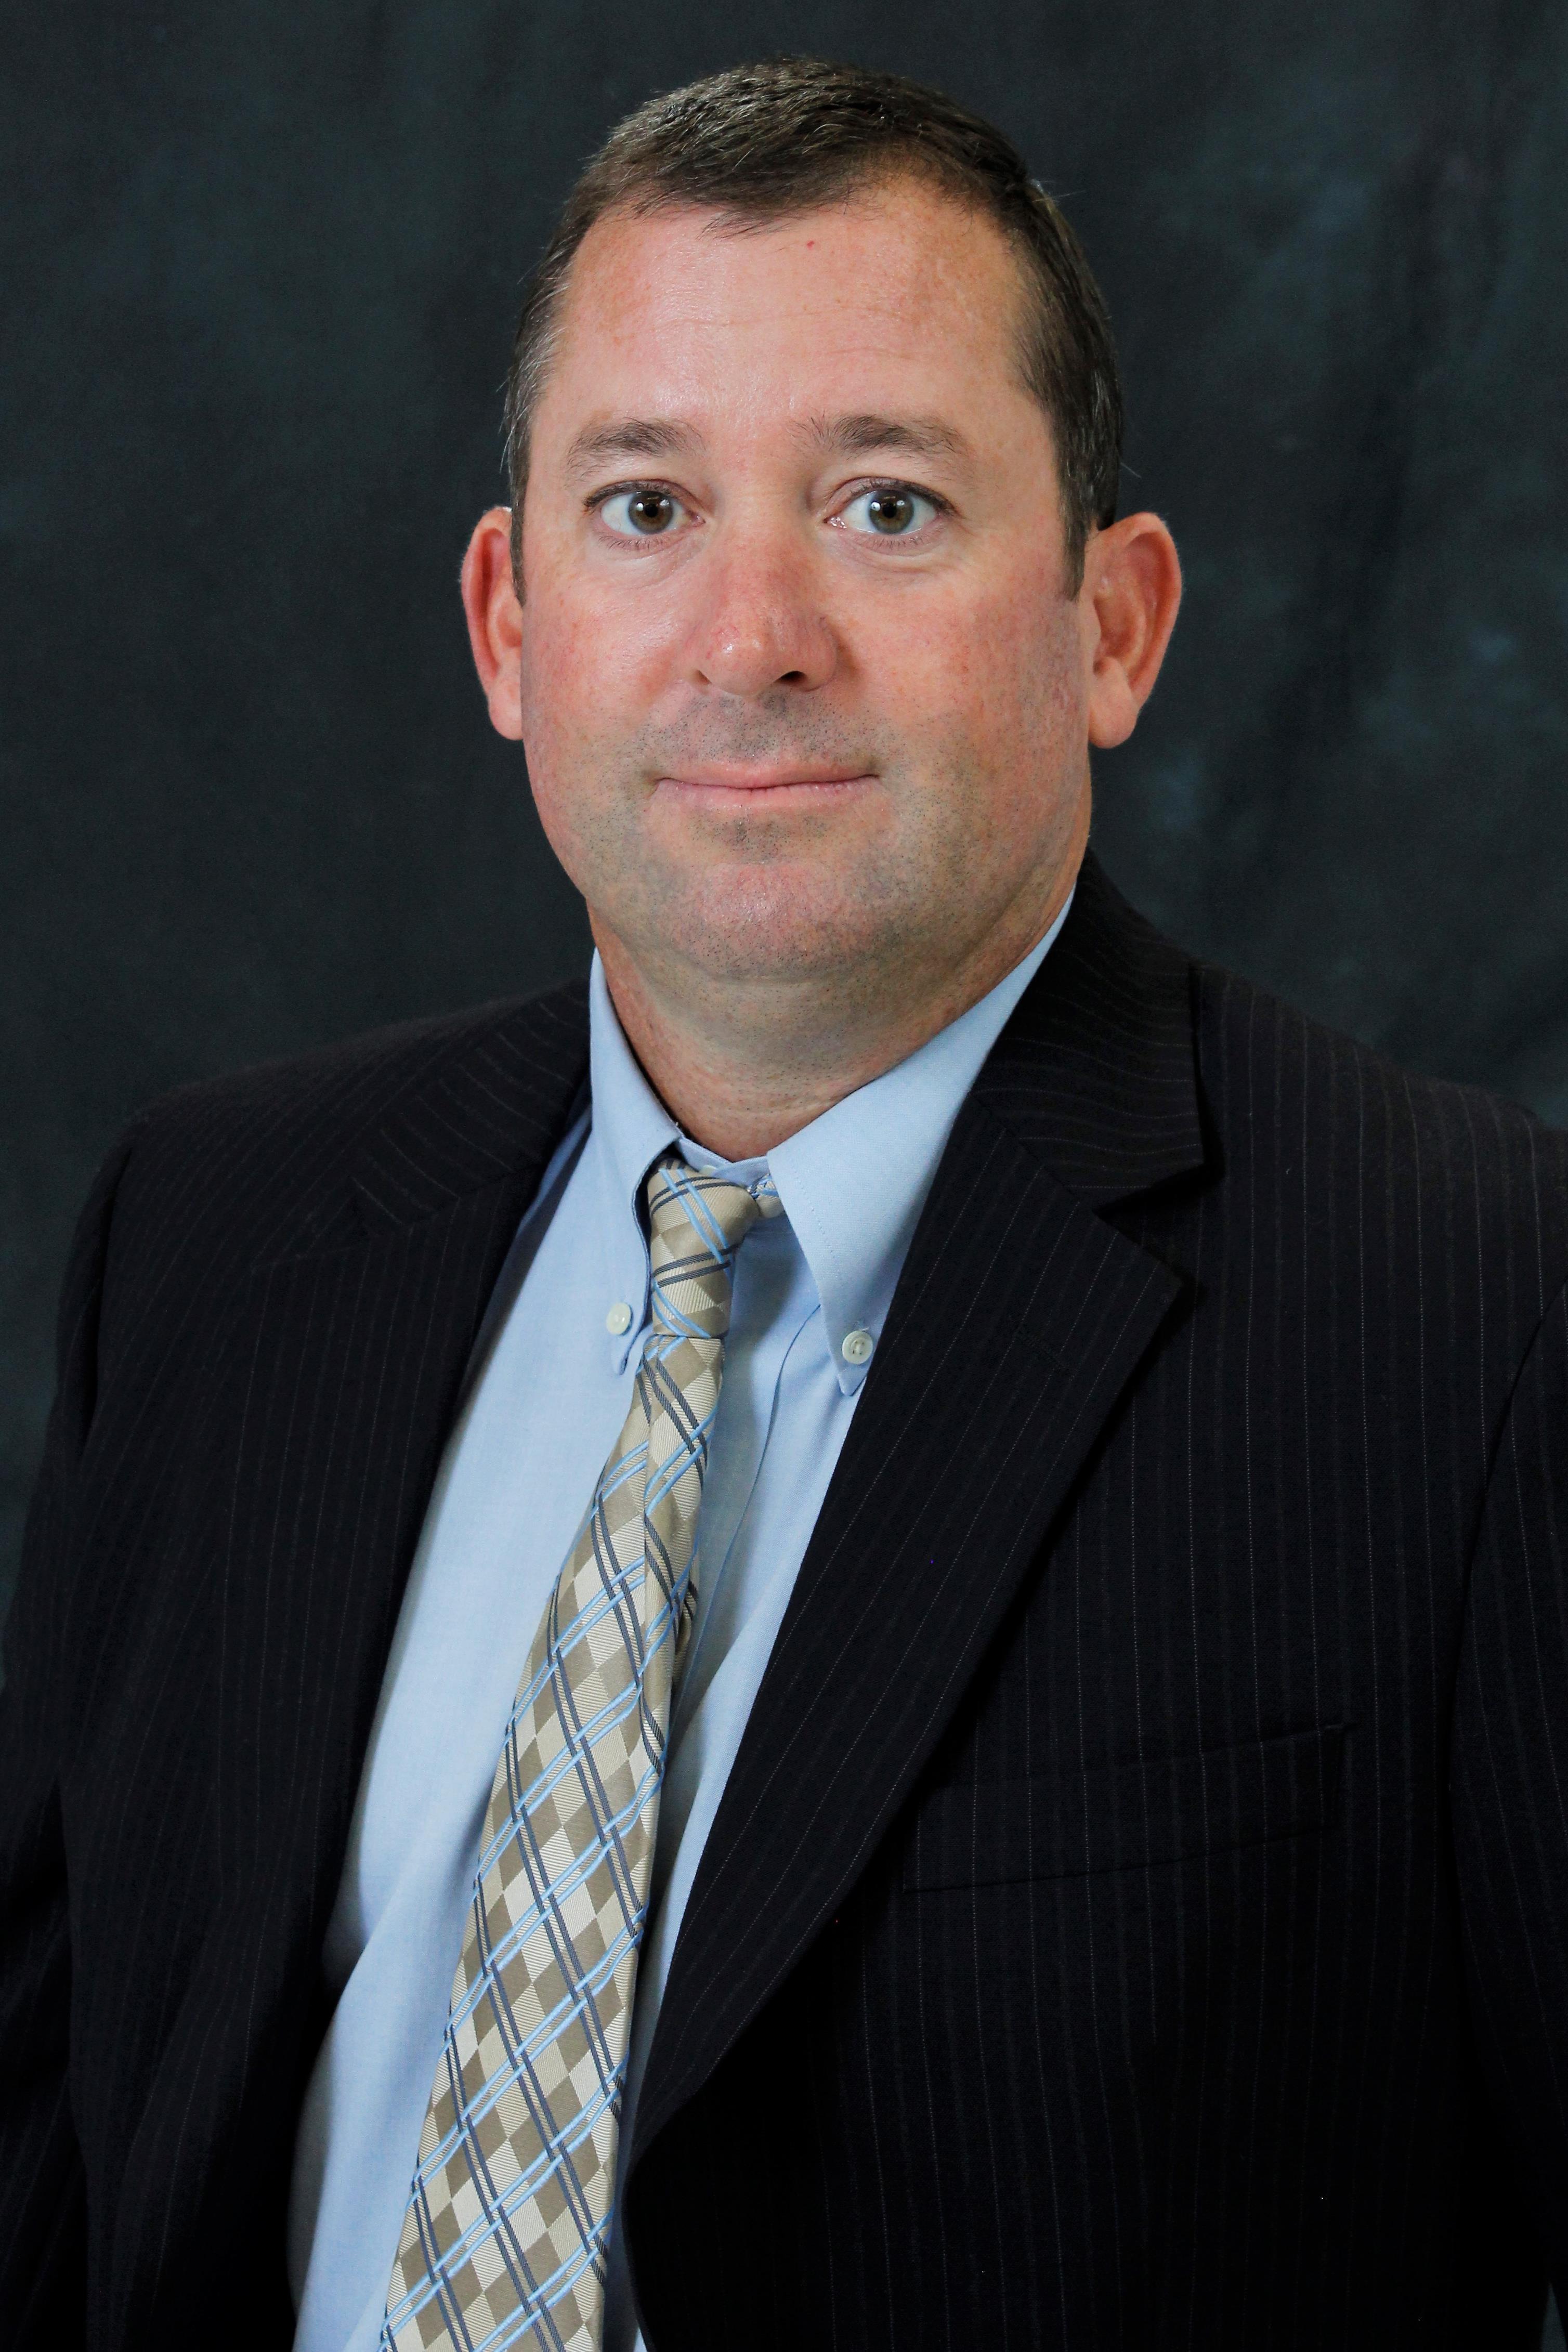 Mr. Smith, Principal